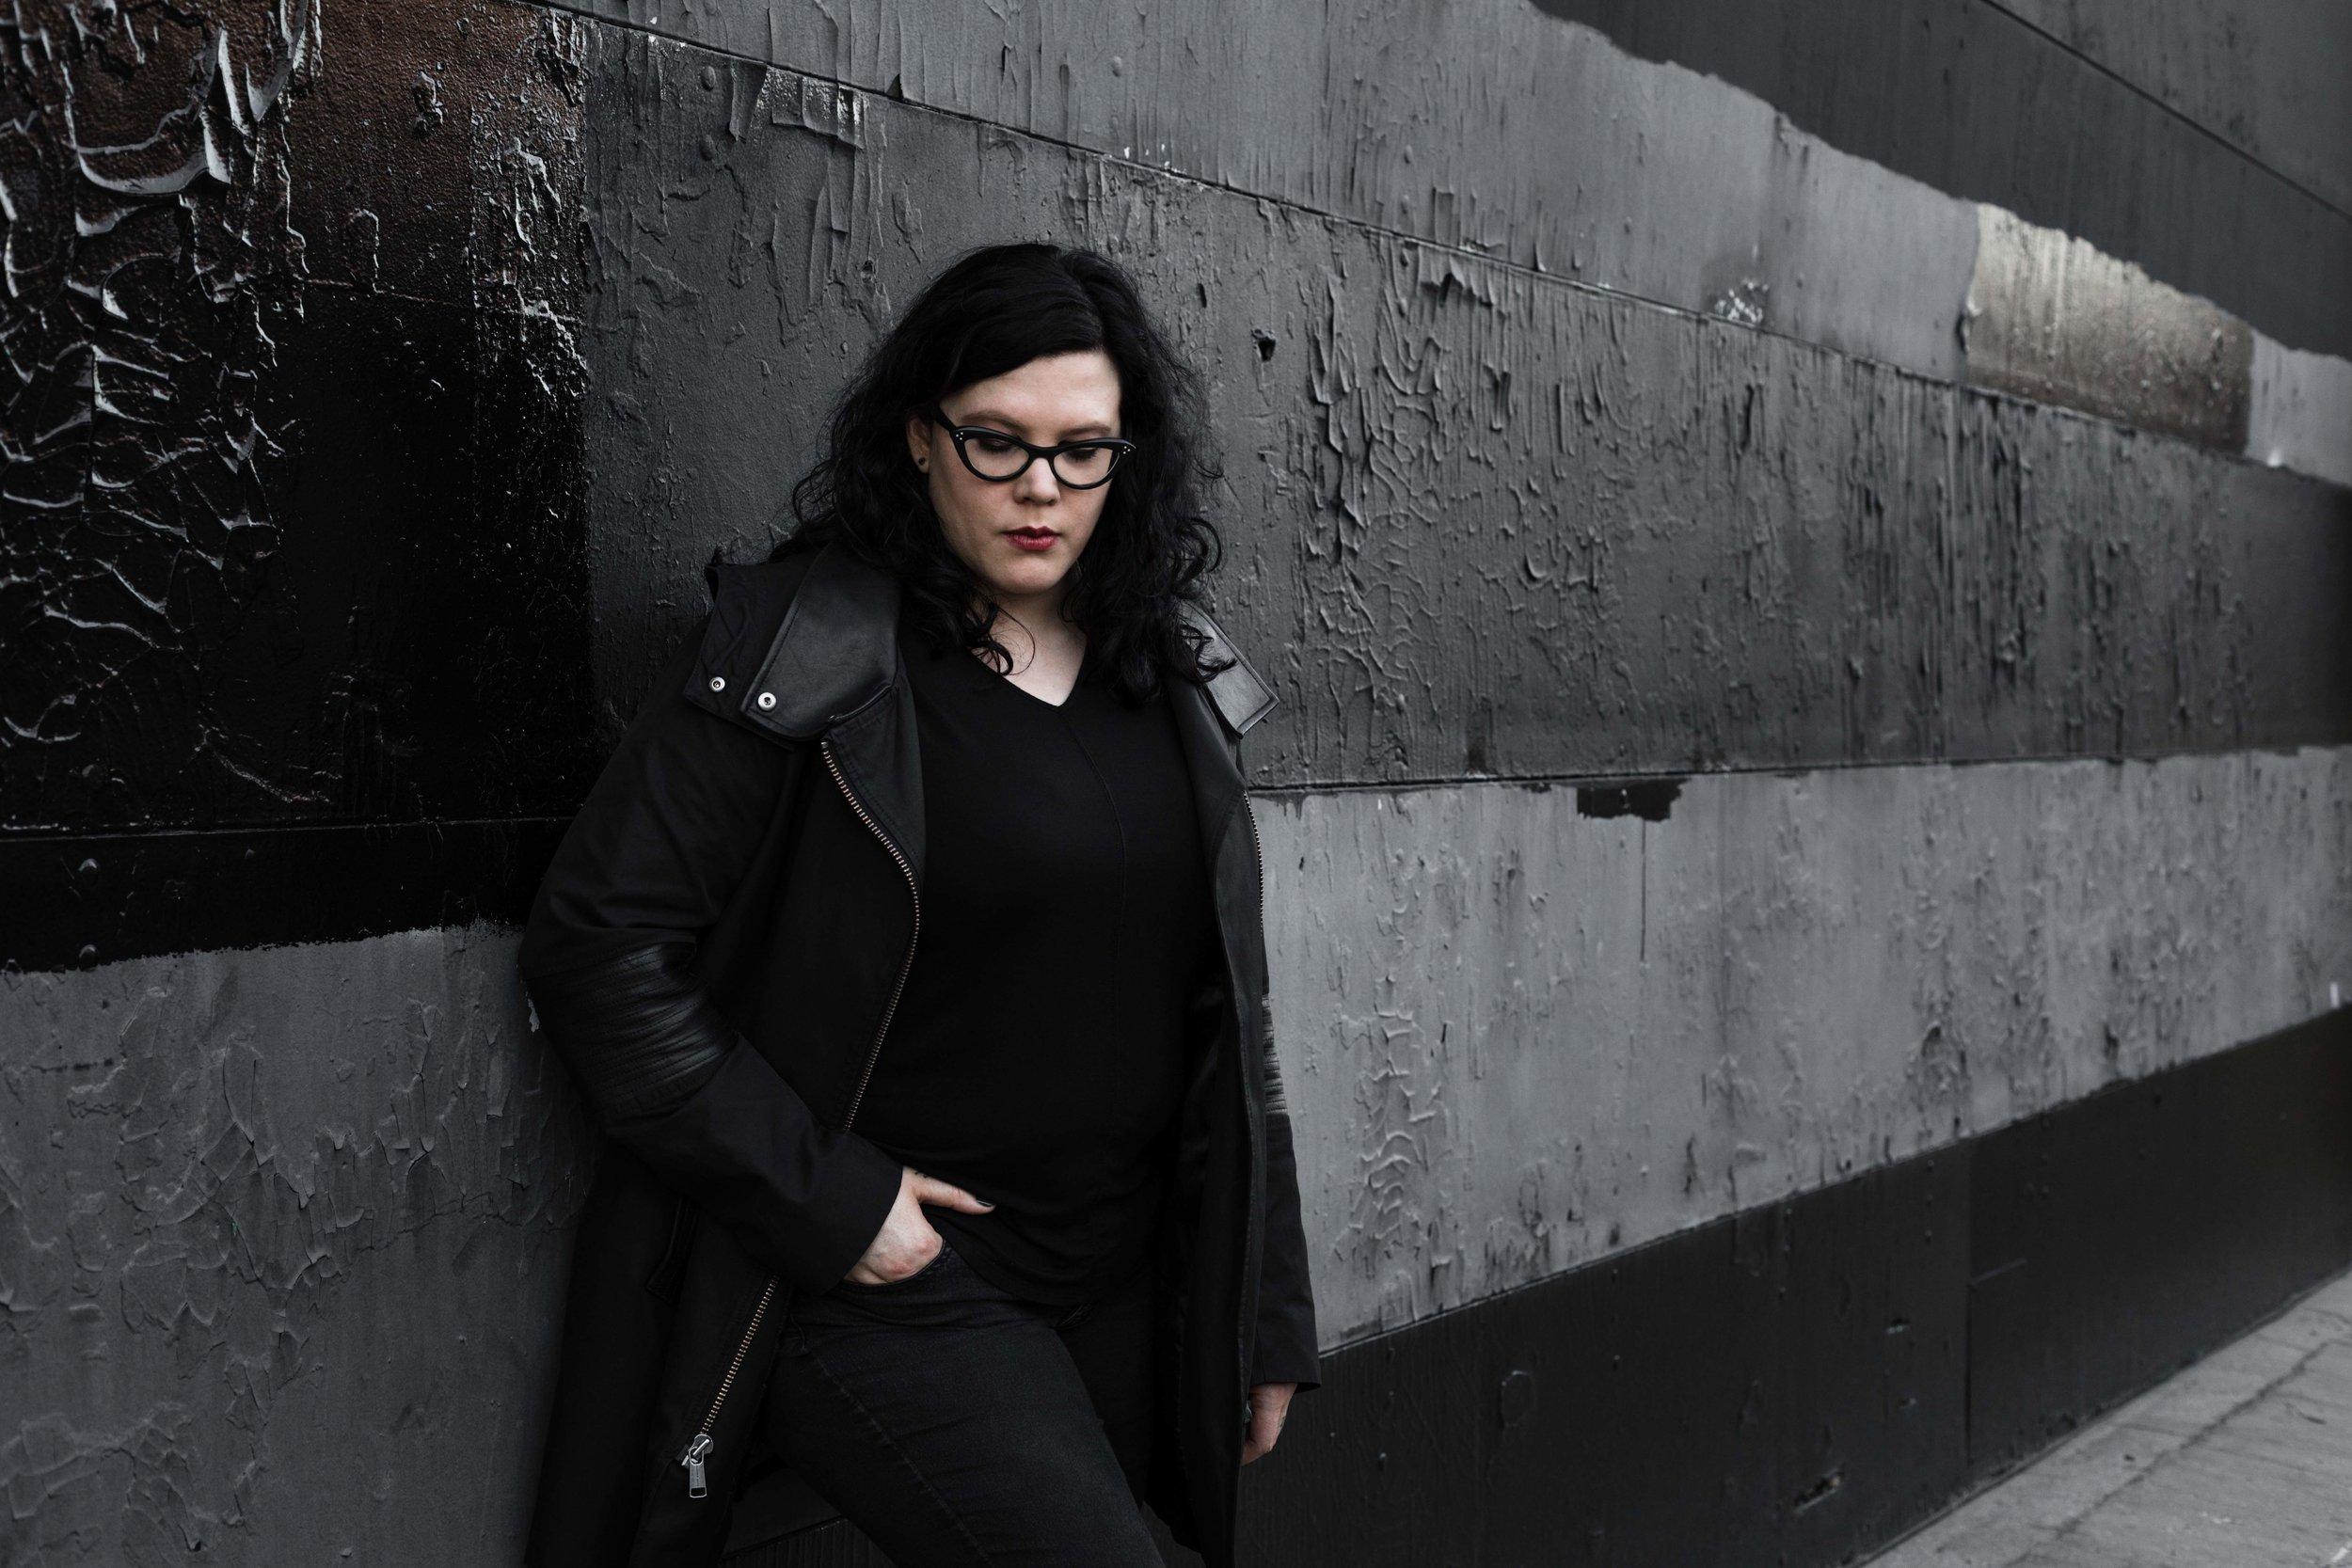 Chicago personal branding photographer Katharine Hannah photographs feminist author Layne Fargo